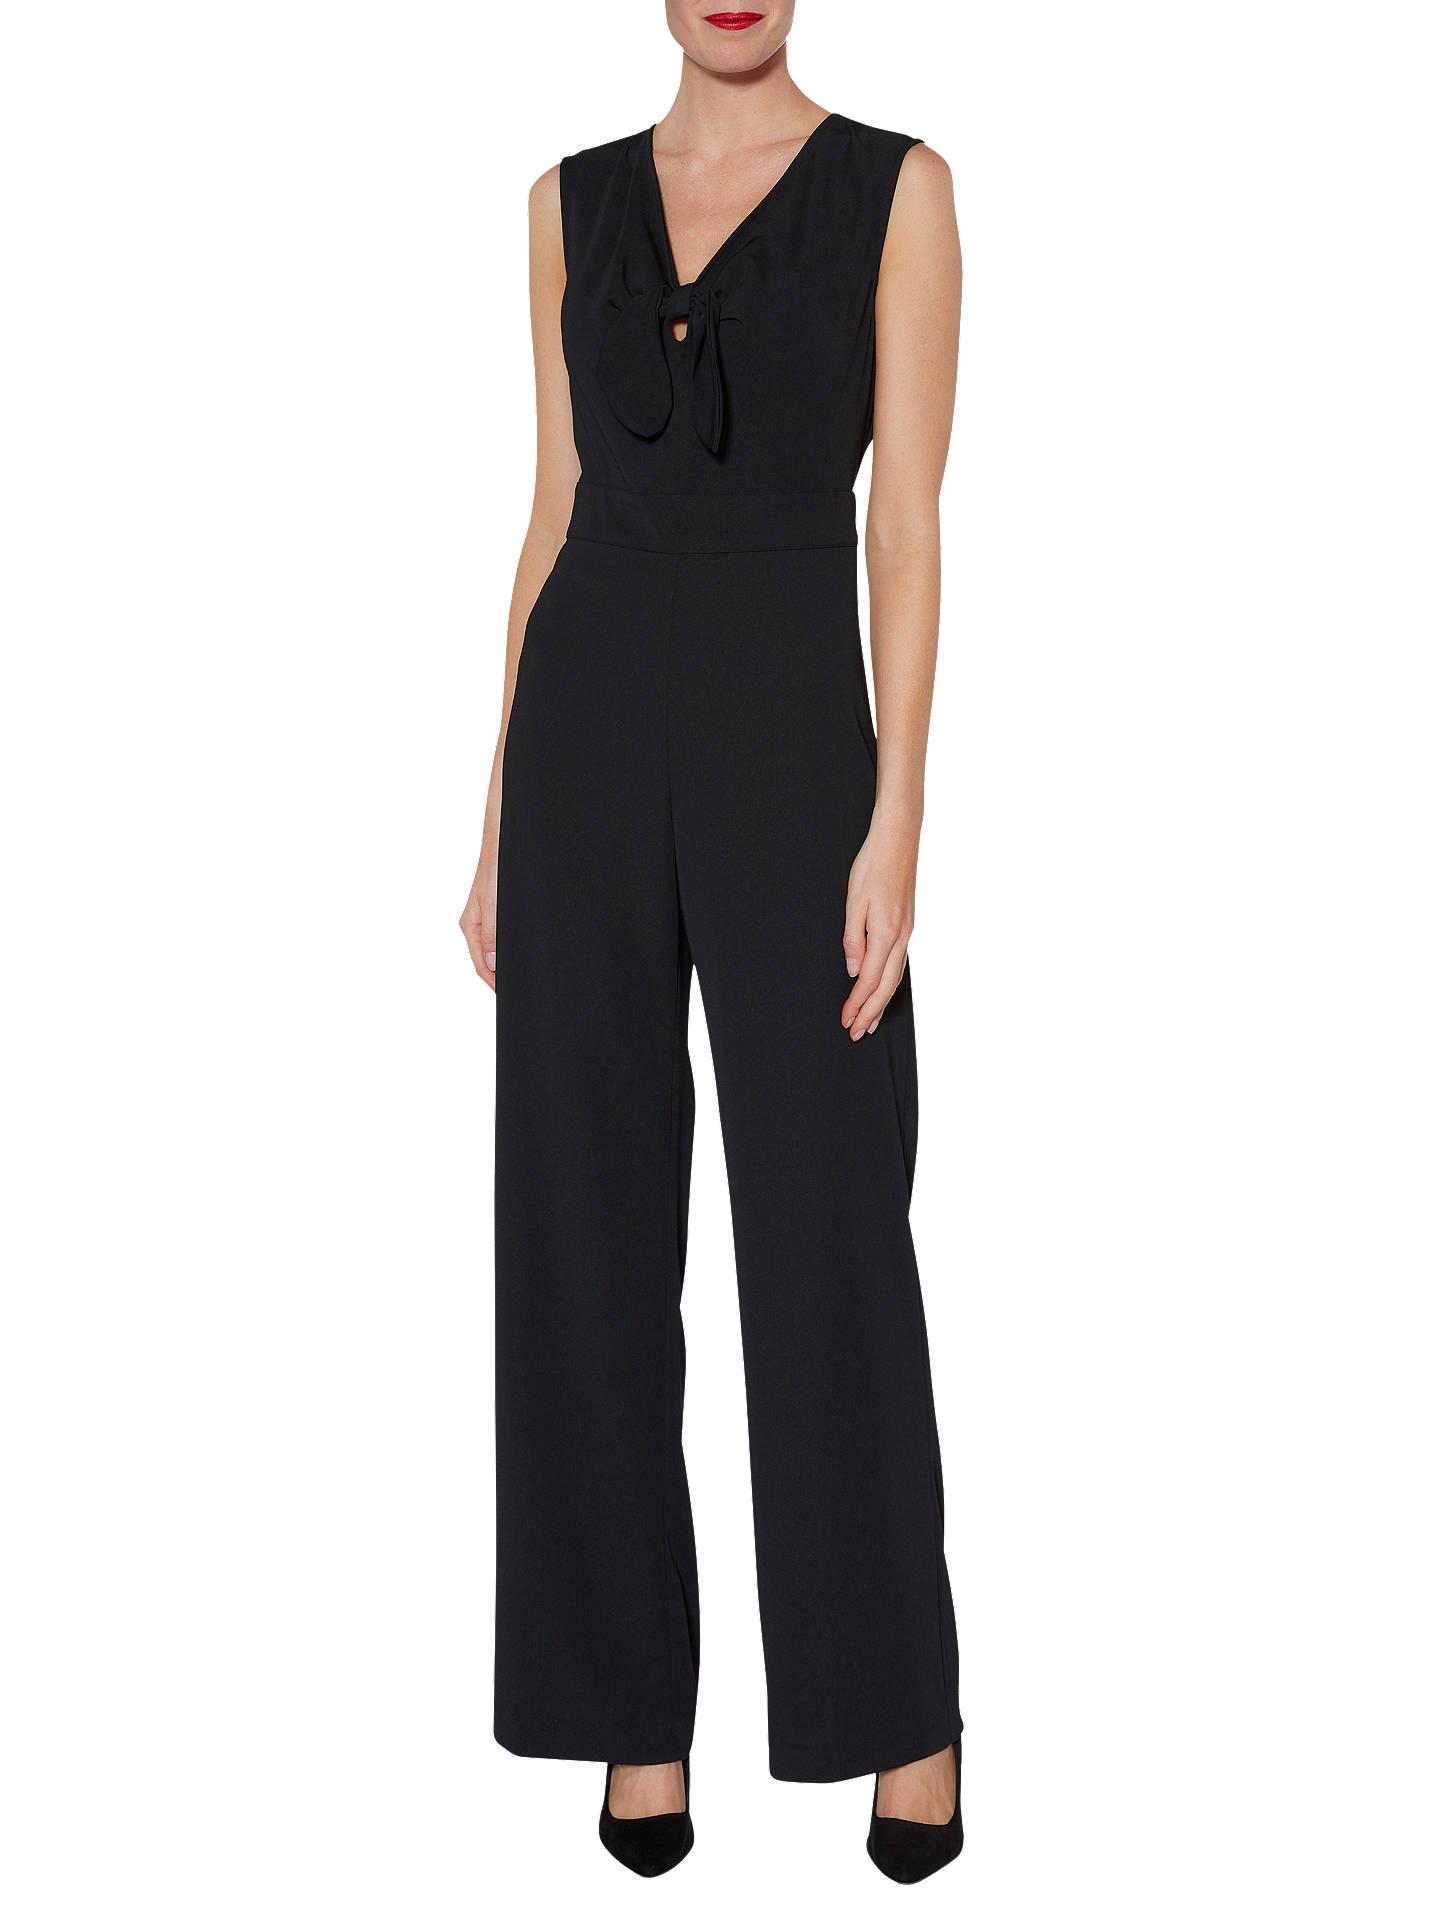 c1e551667d11 Buy Gina Bacconi Cleo Bow Detail Jumpsuit, Black, 16 Online at  johnlewis.com ...